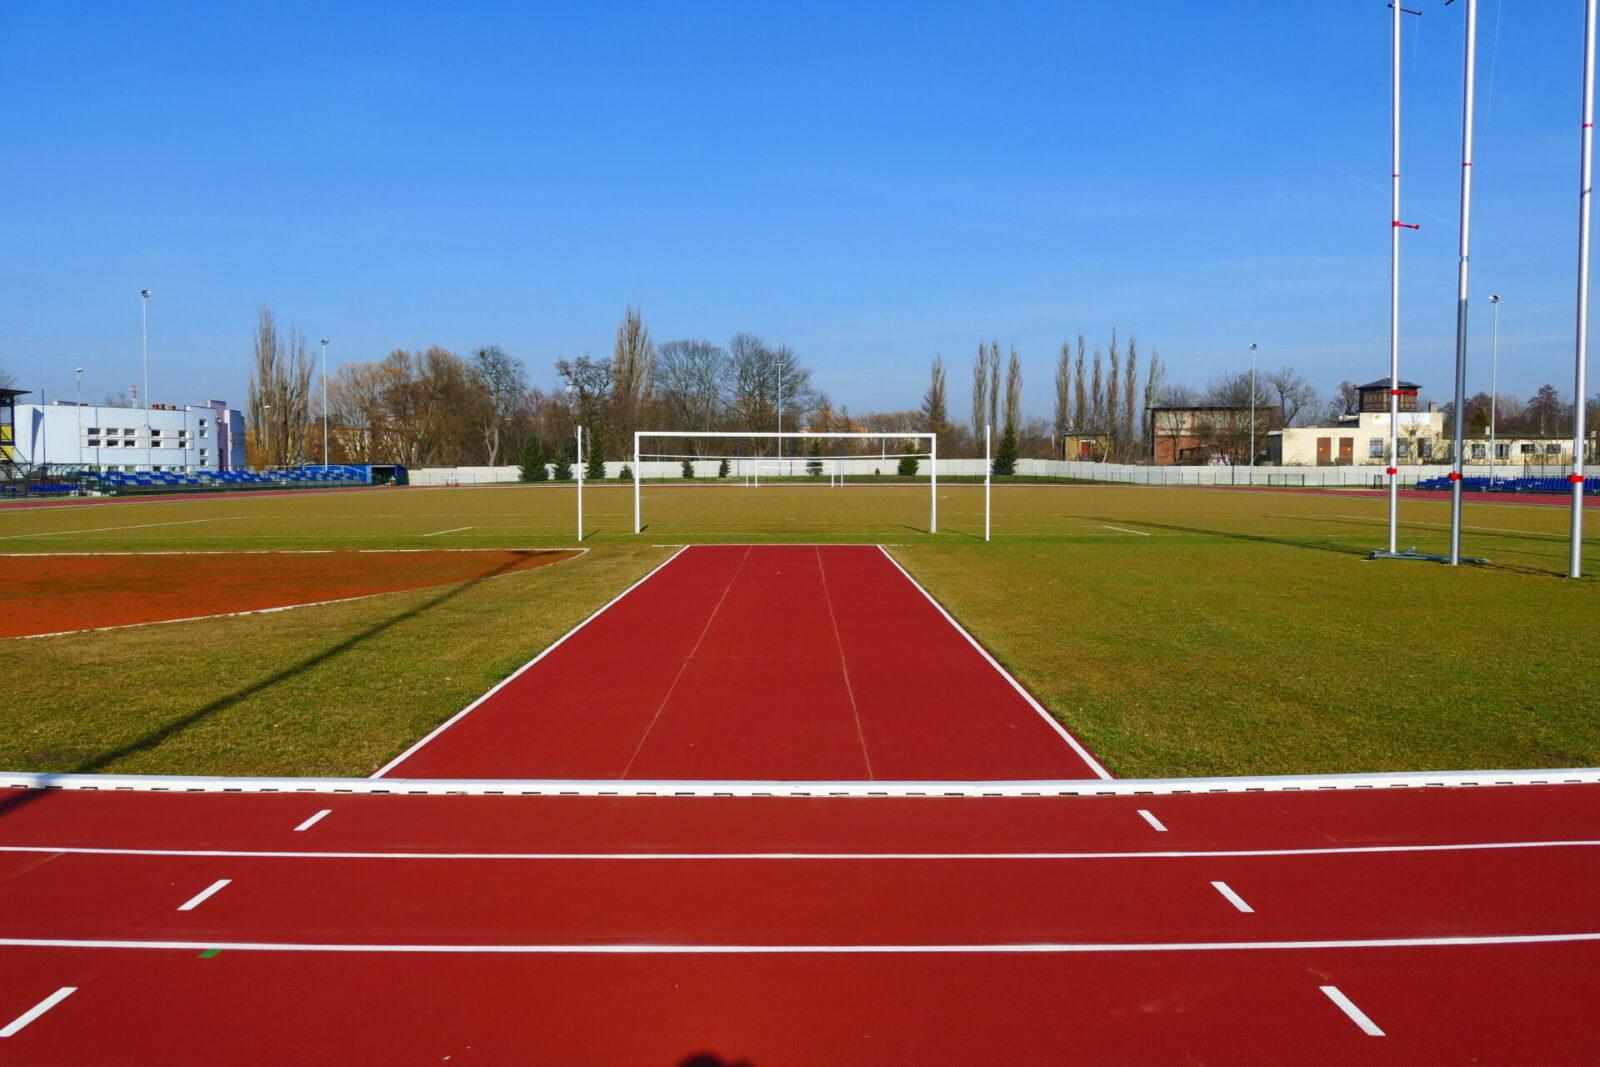 Stadion - Rzutnia.